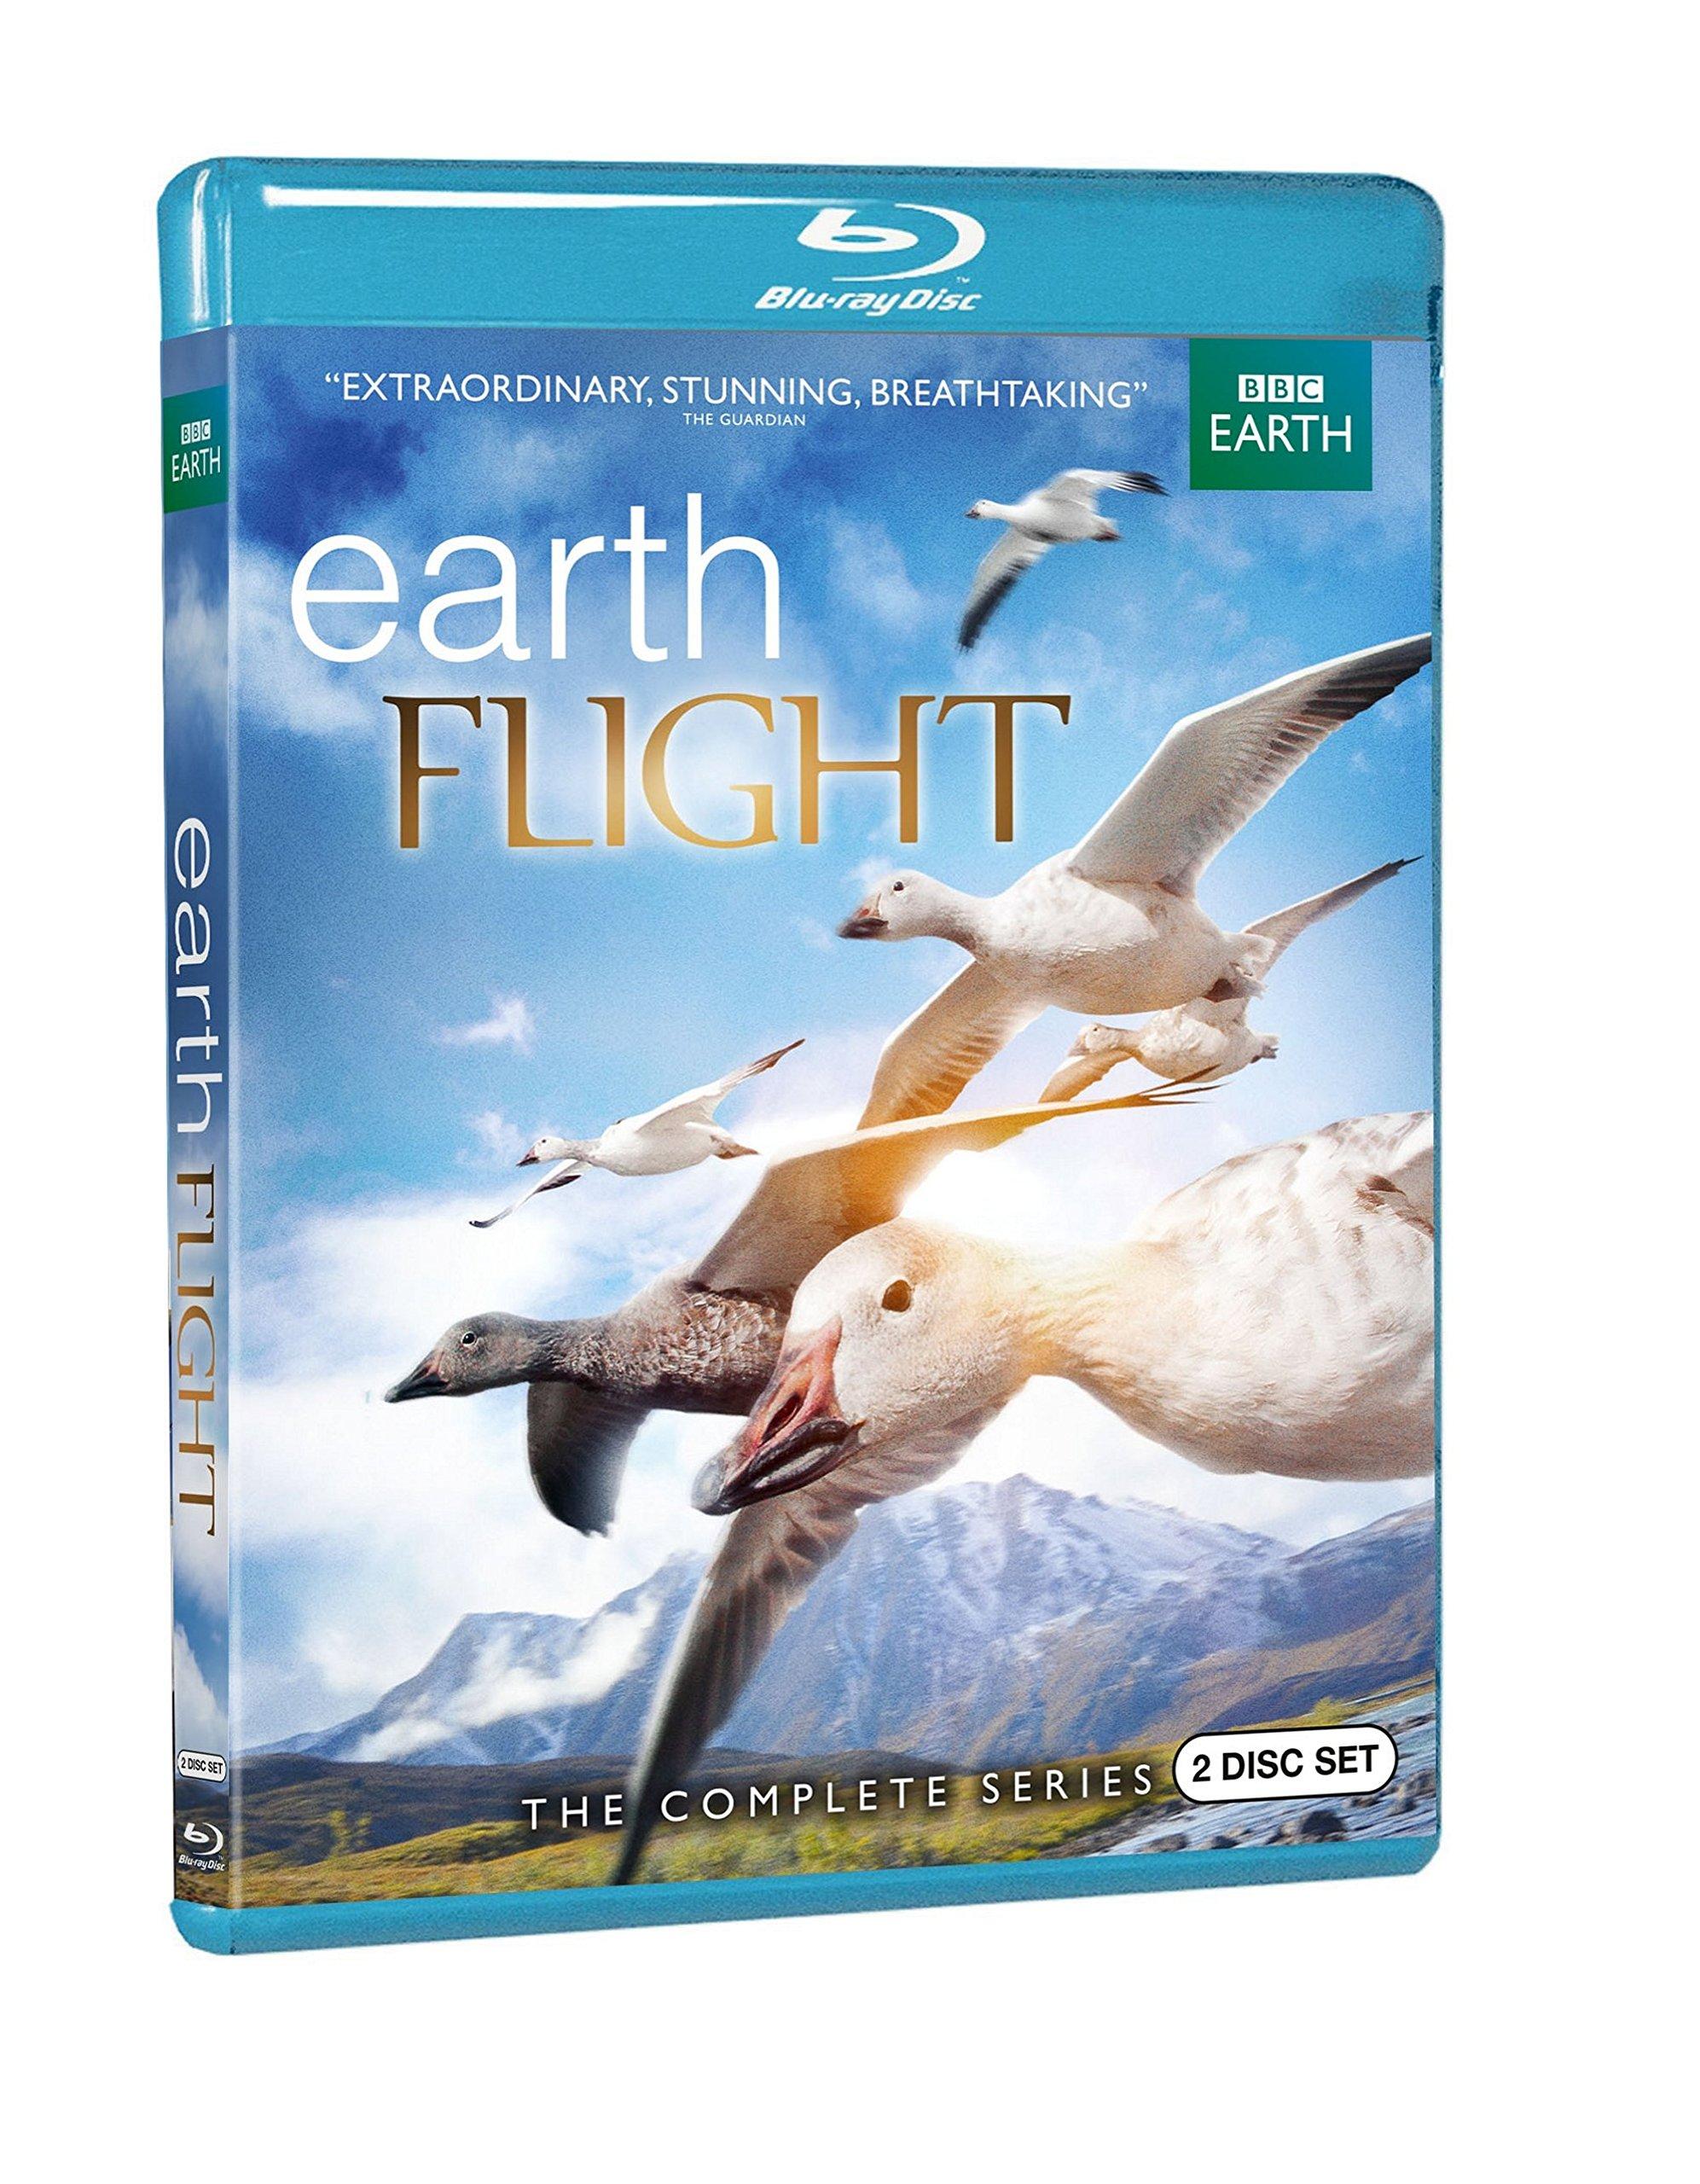 Earthflight: The Complete Series (Blu-ray)